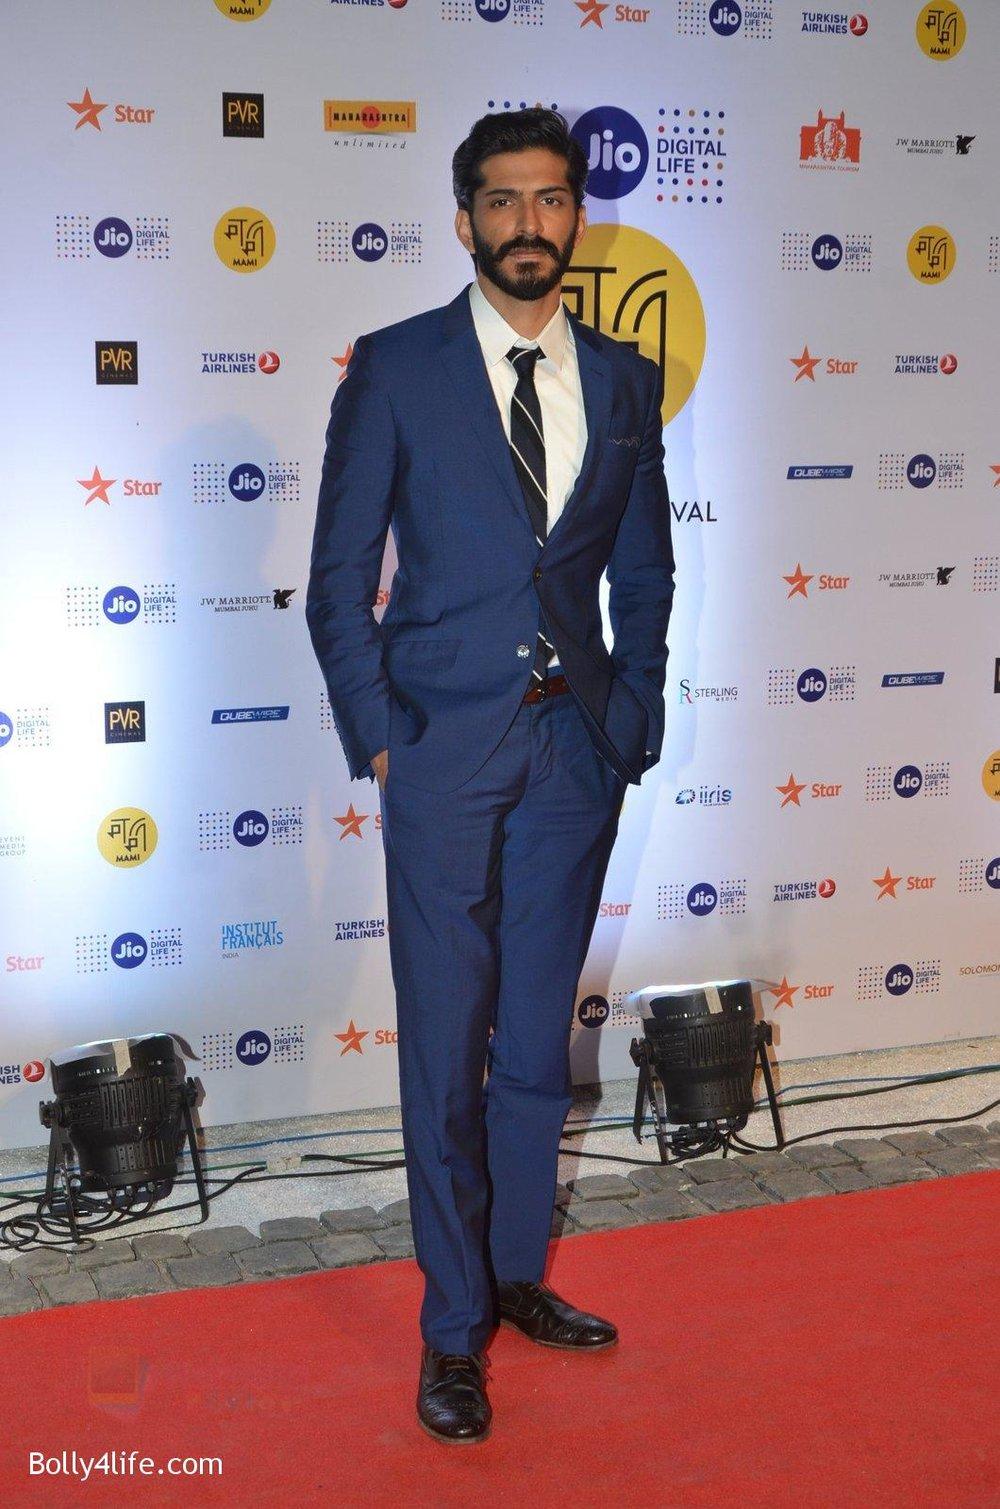 Harshvardhan-Kapoor-at-MAMI-Film-Festival-2016-on-20th-Oct-2016-311.jpg